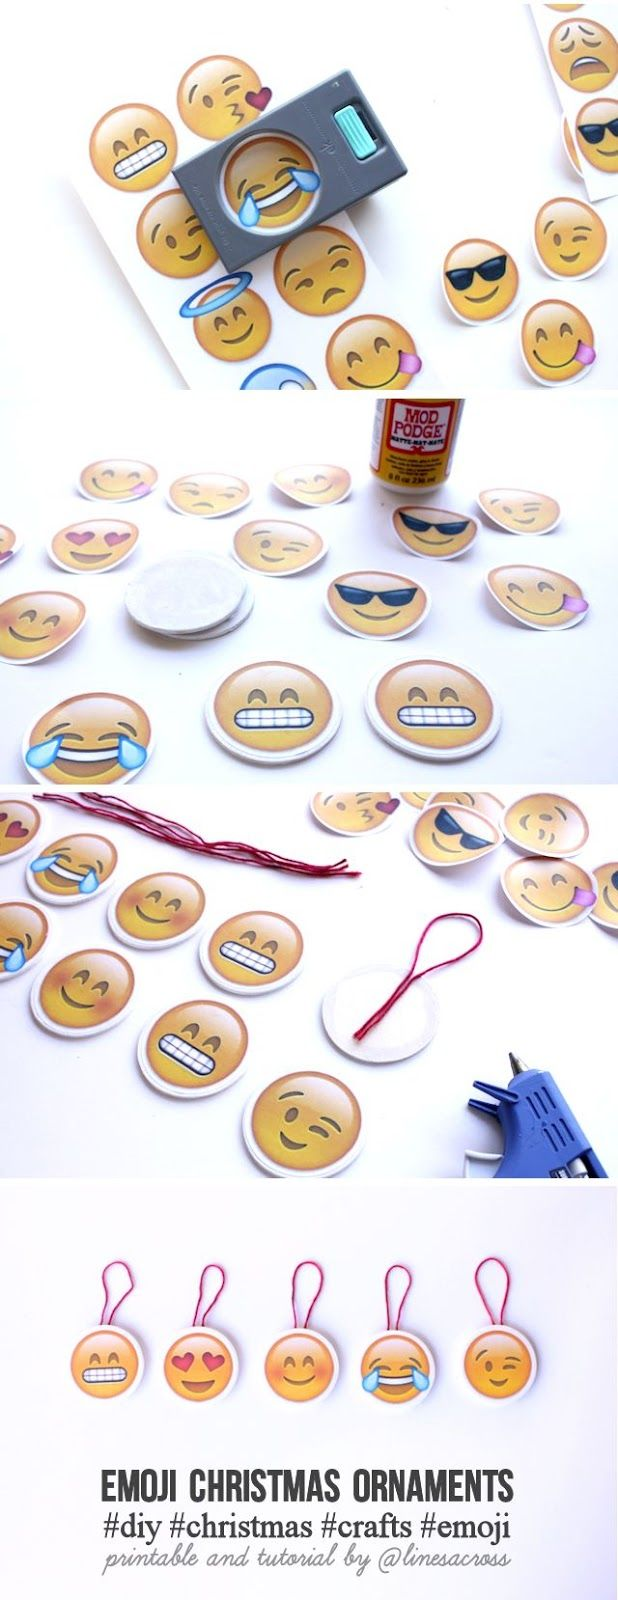 S more ornaments - Diy Emoji Christmas Ornaments